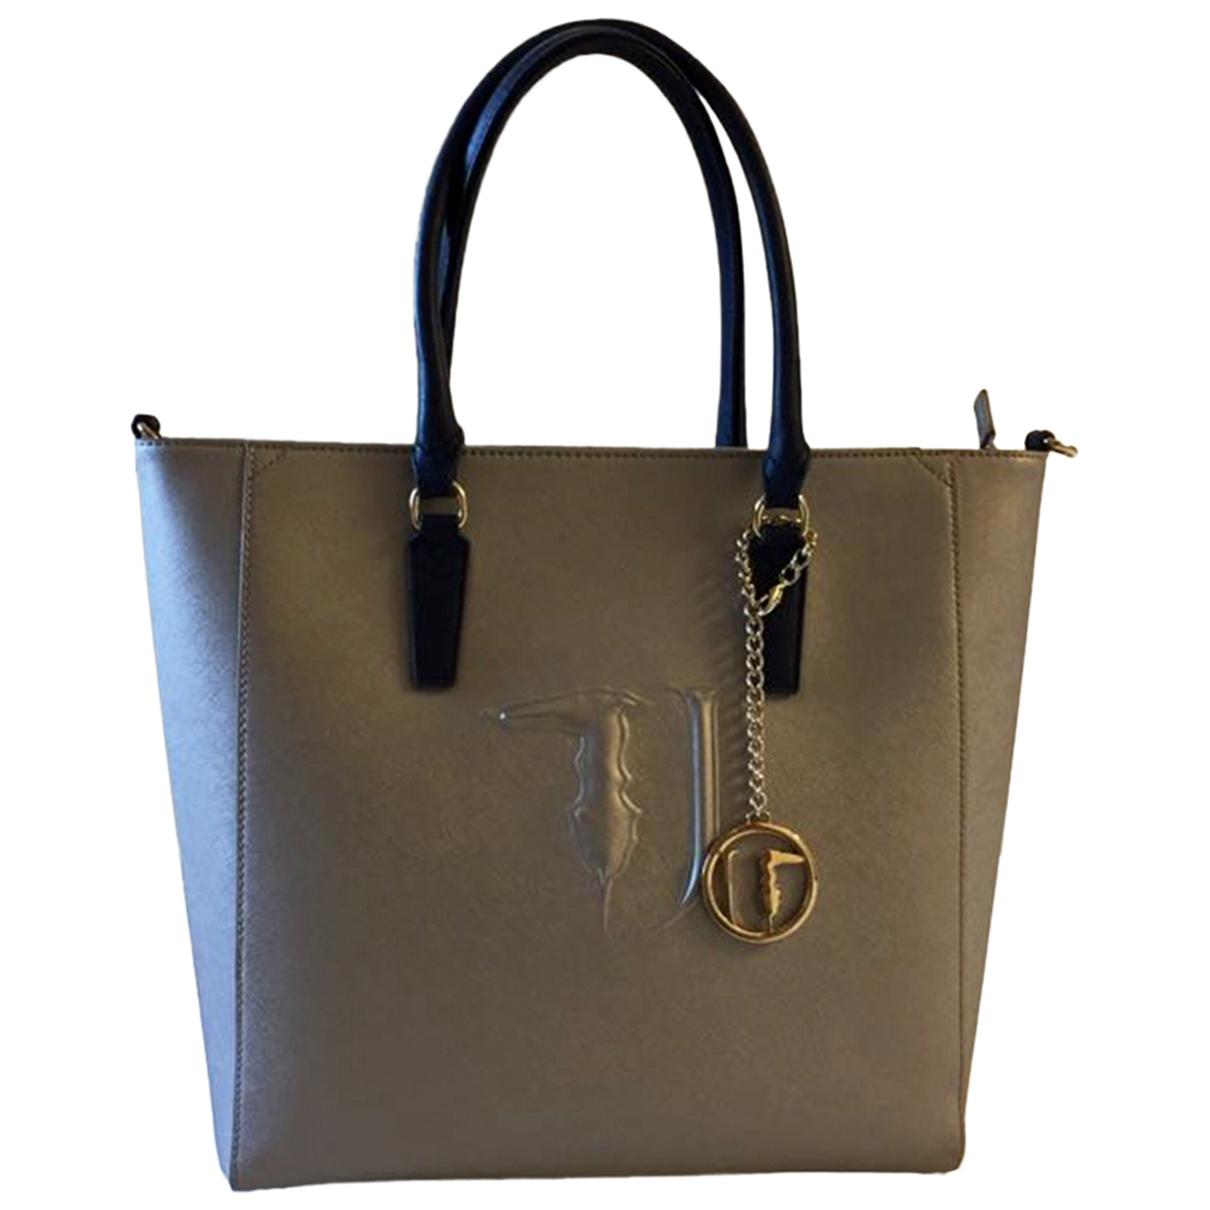 Trussardi Jeans \N Silver handbag for Women \N